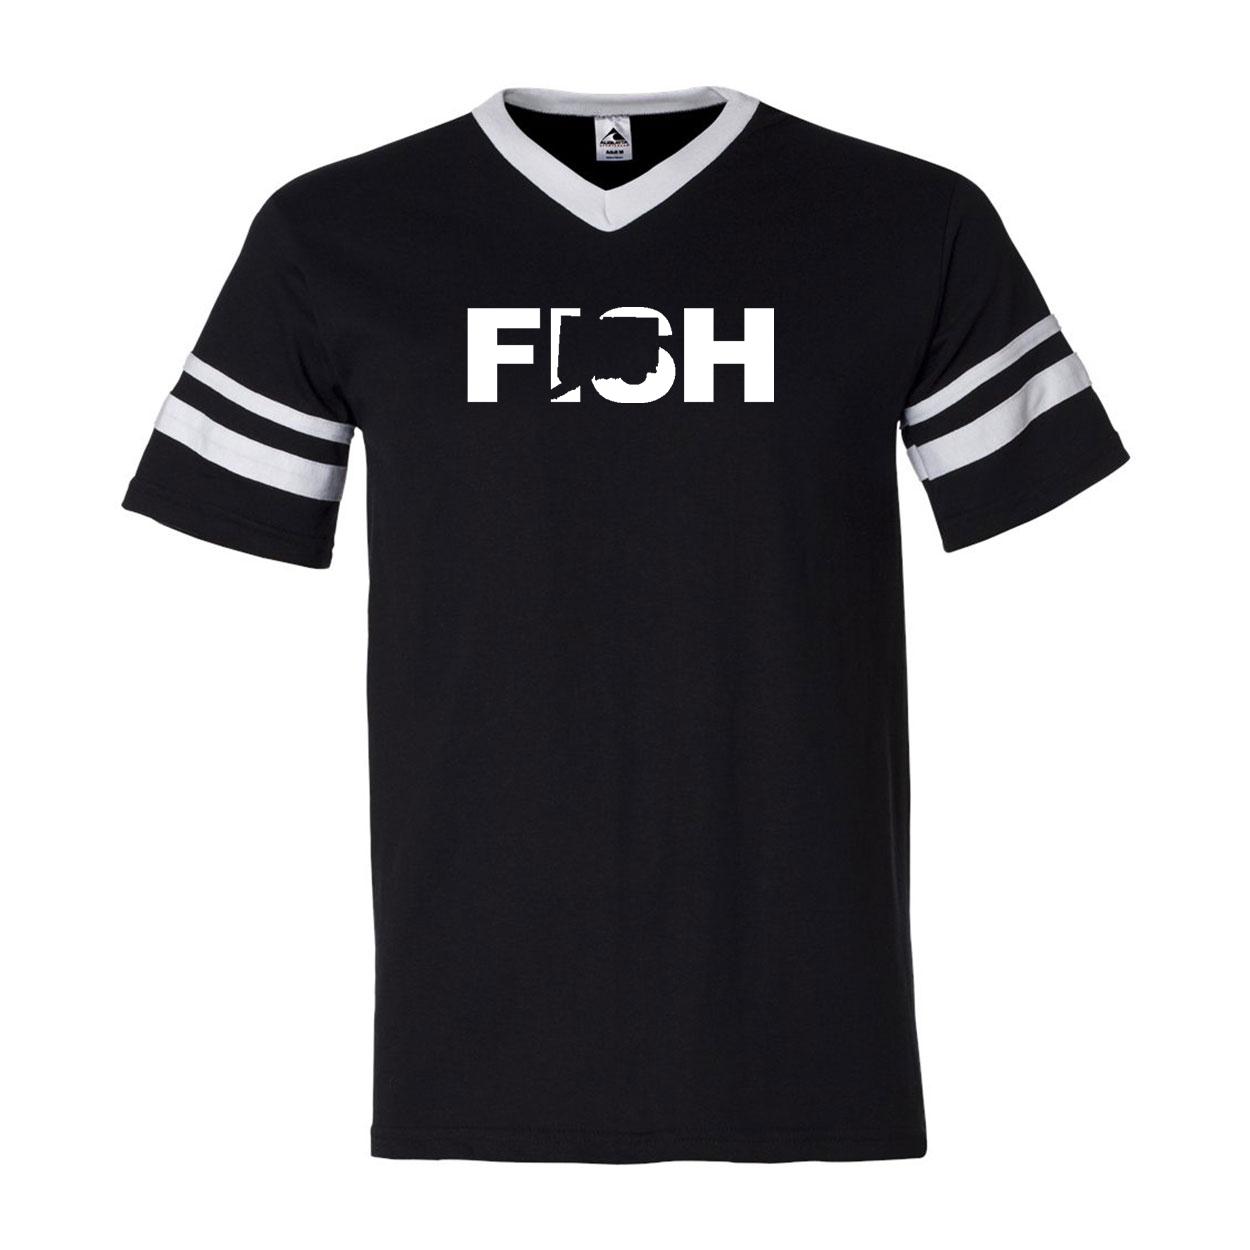 Fish Connecticut Classic Premium Striped Jersey T-Shirt Black/White (White Logo)